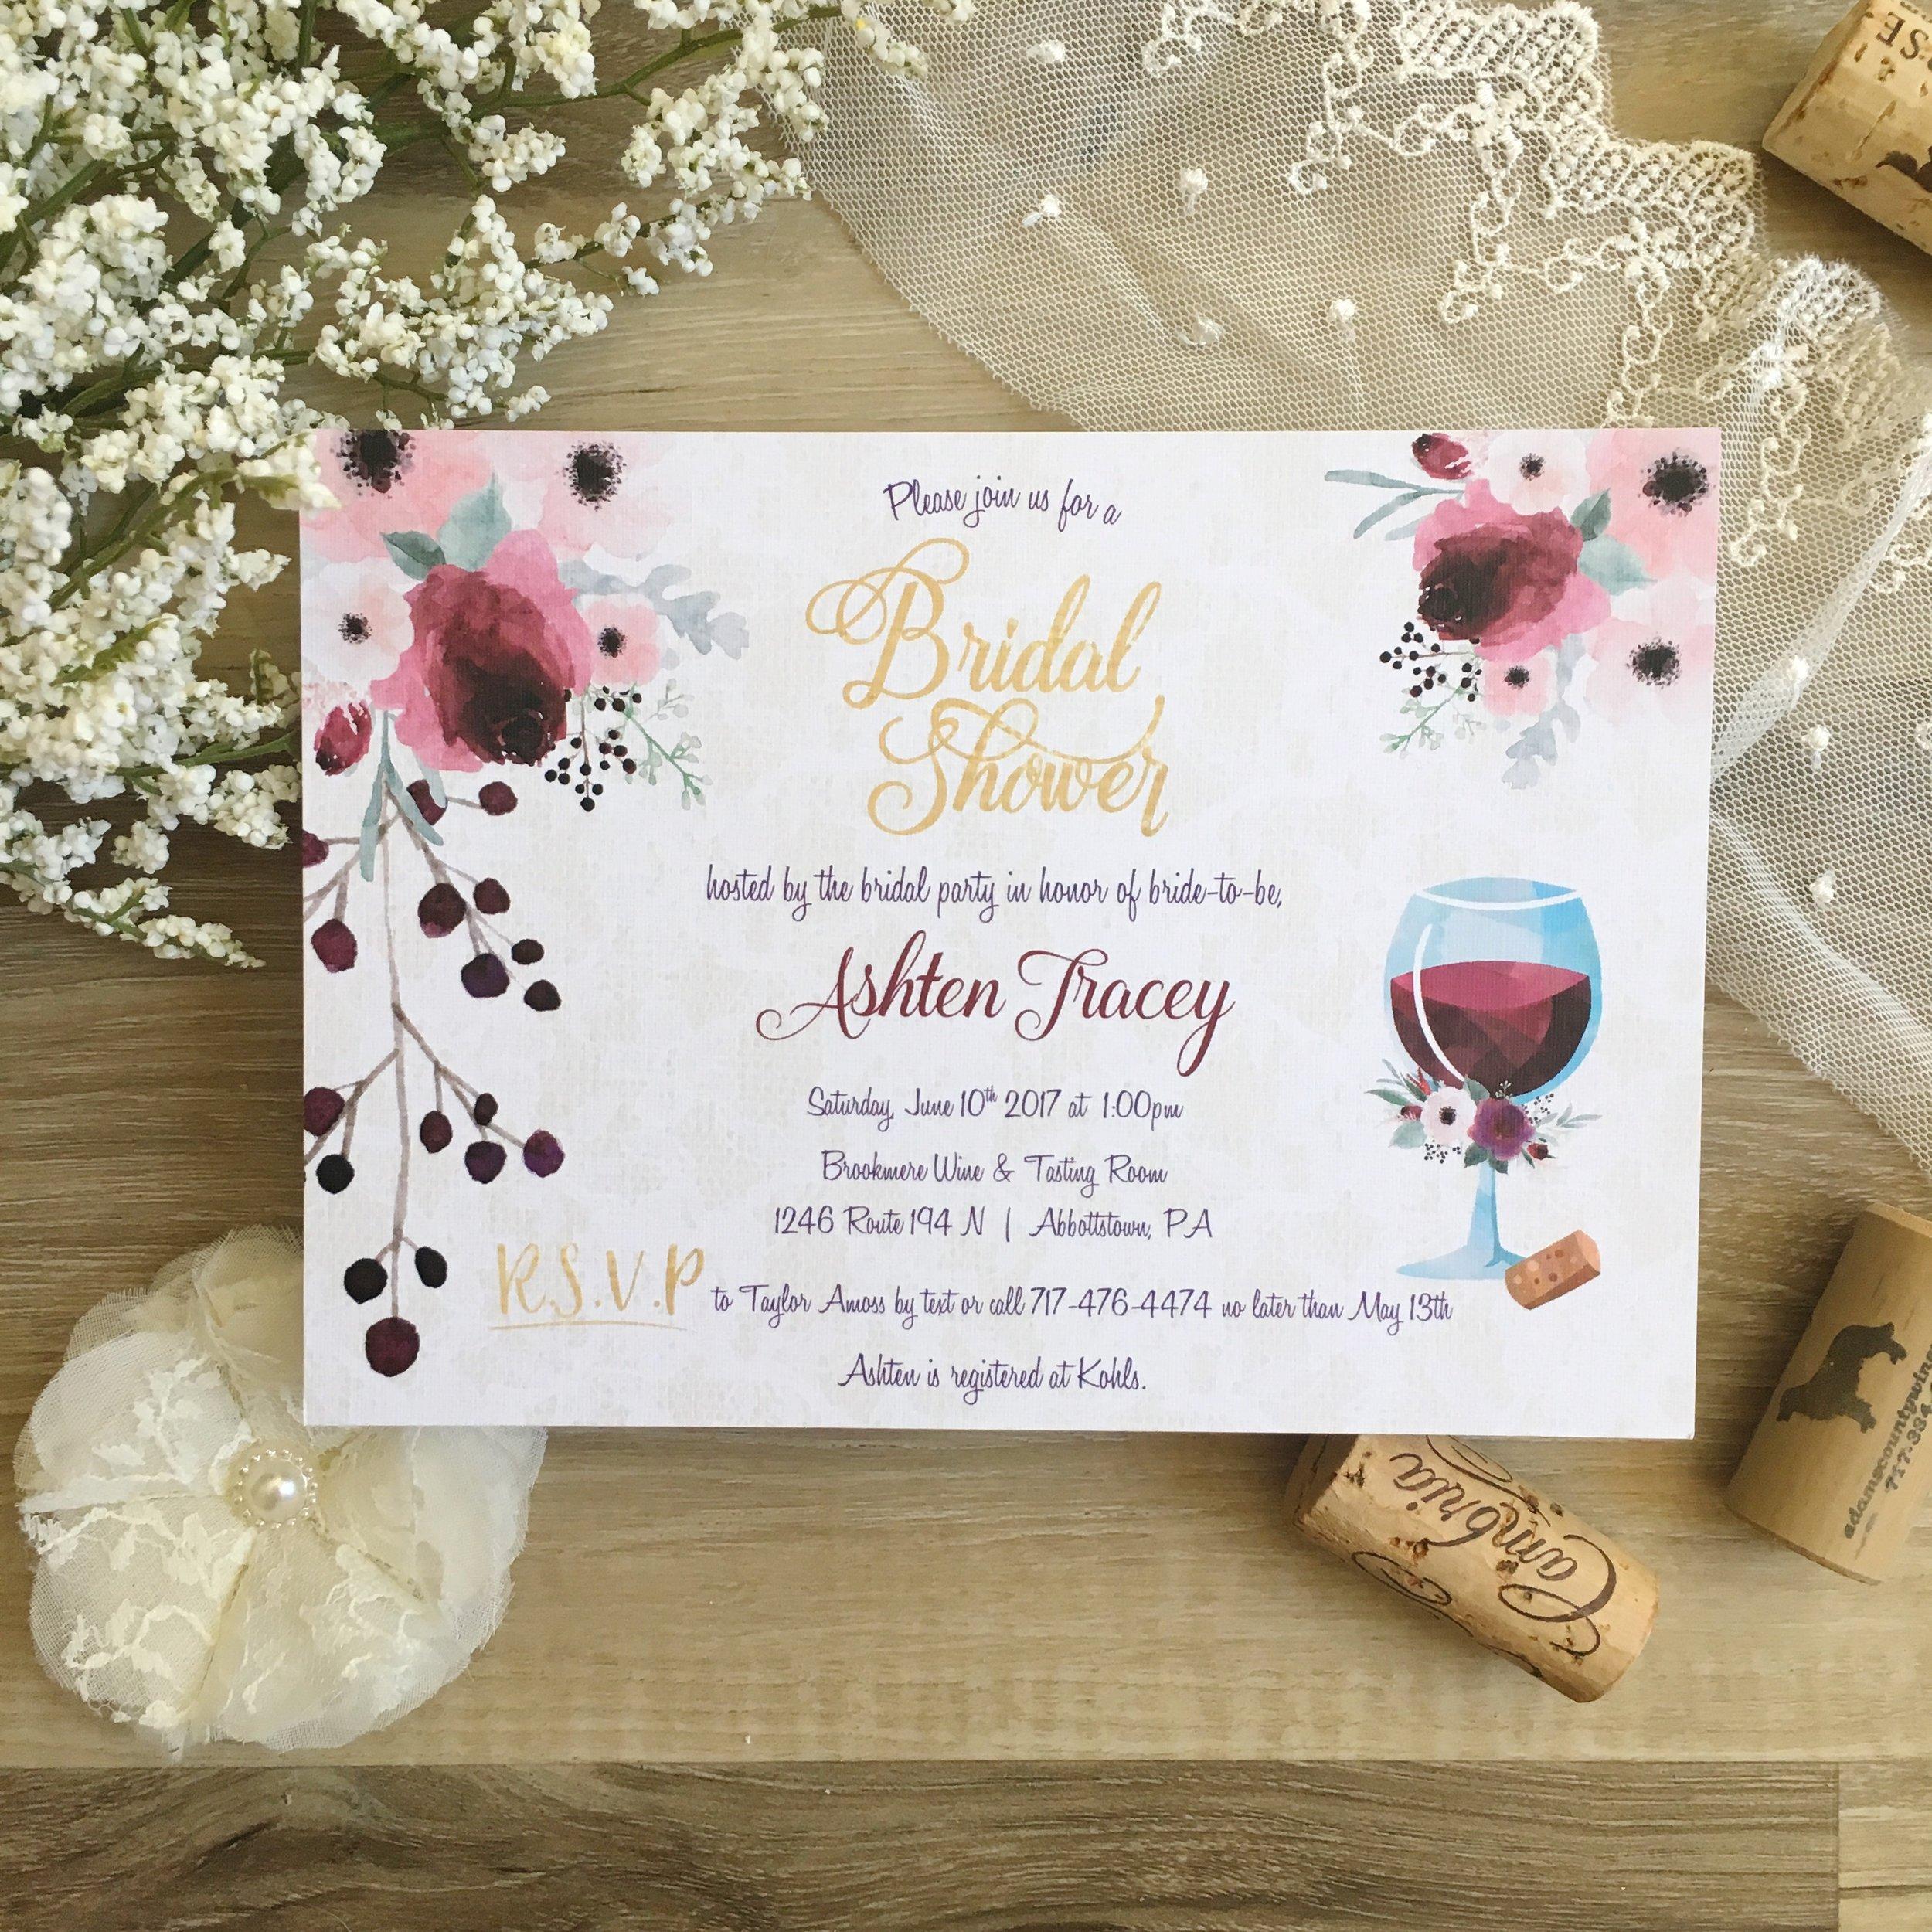 Central PA, York PA, JesSmith Designs, custom, wedding, invitations, bridal, announcements, save the date-03-22 17.23.51.jpg